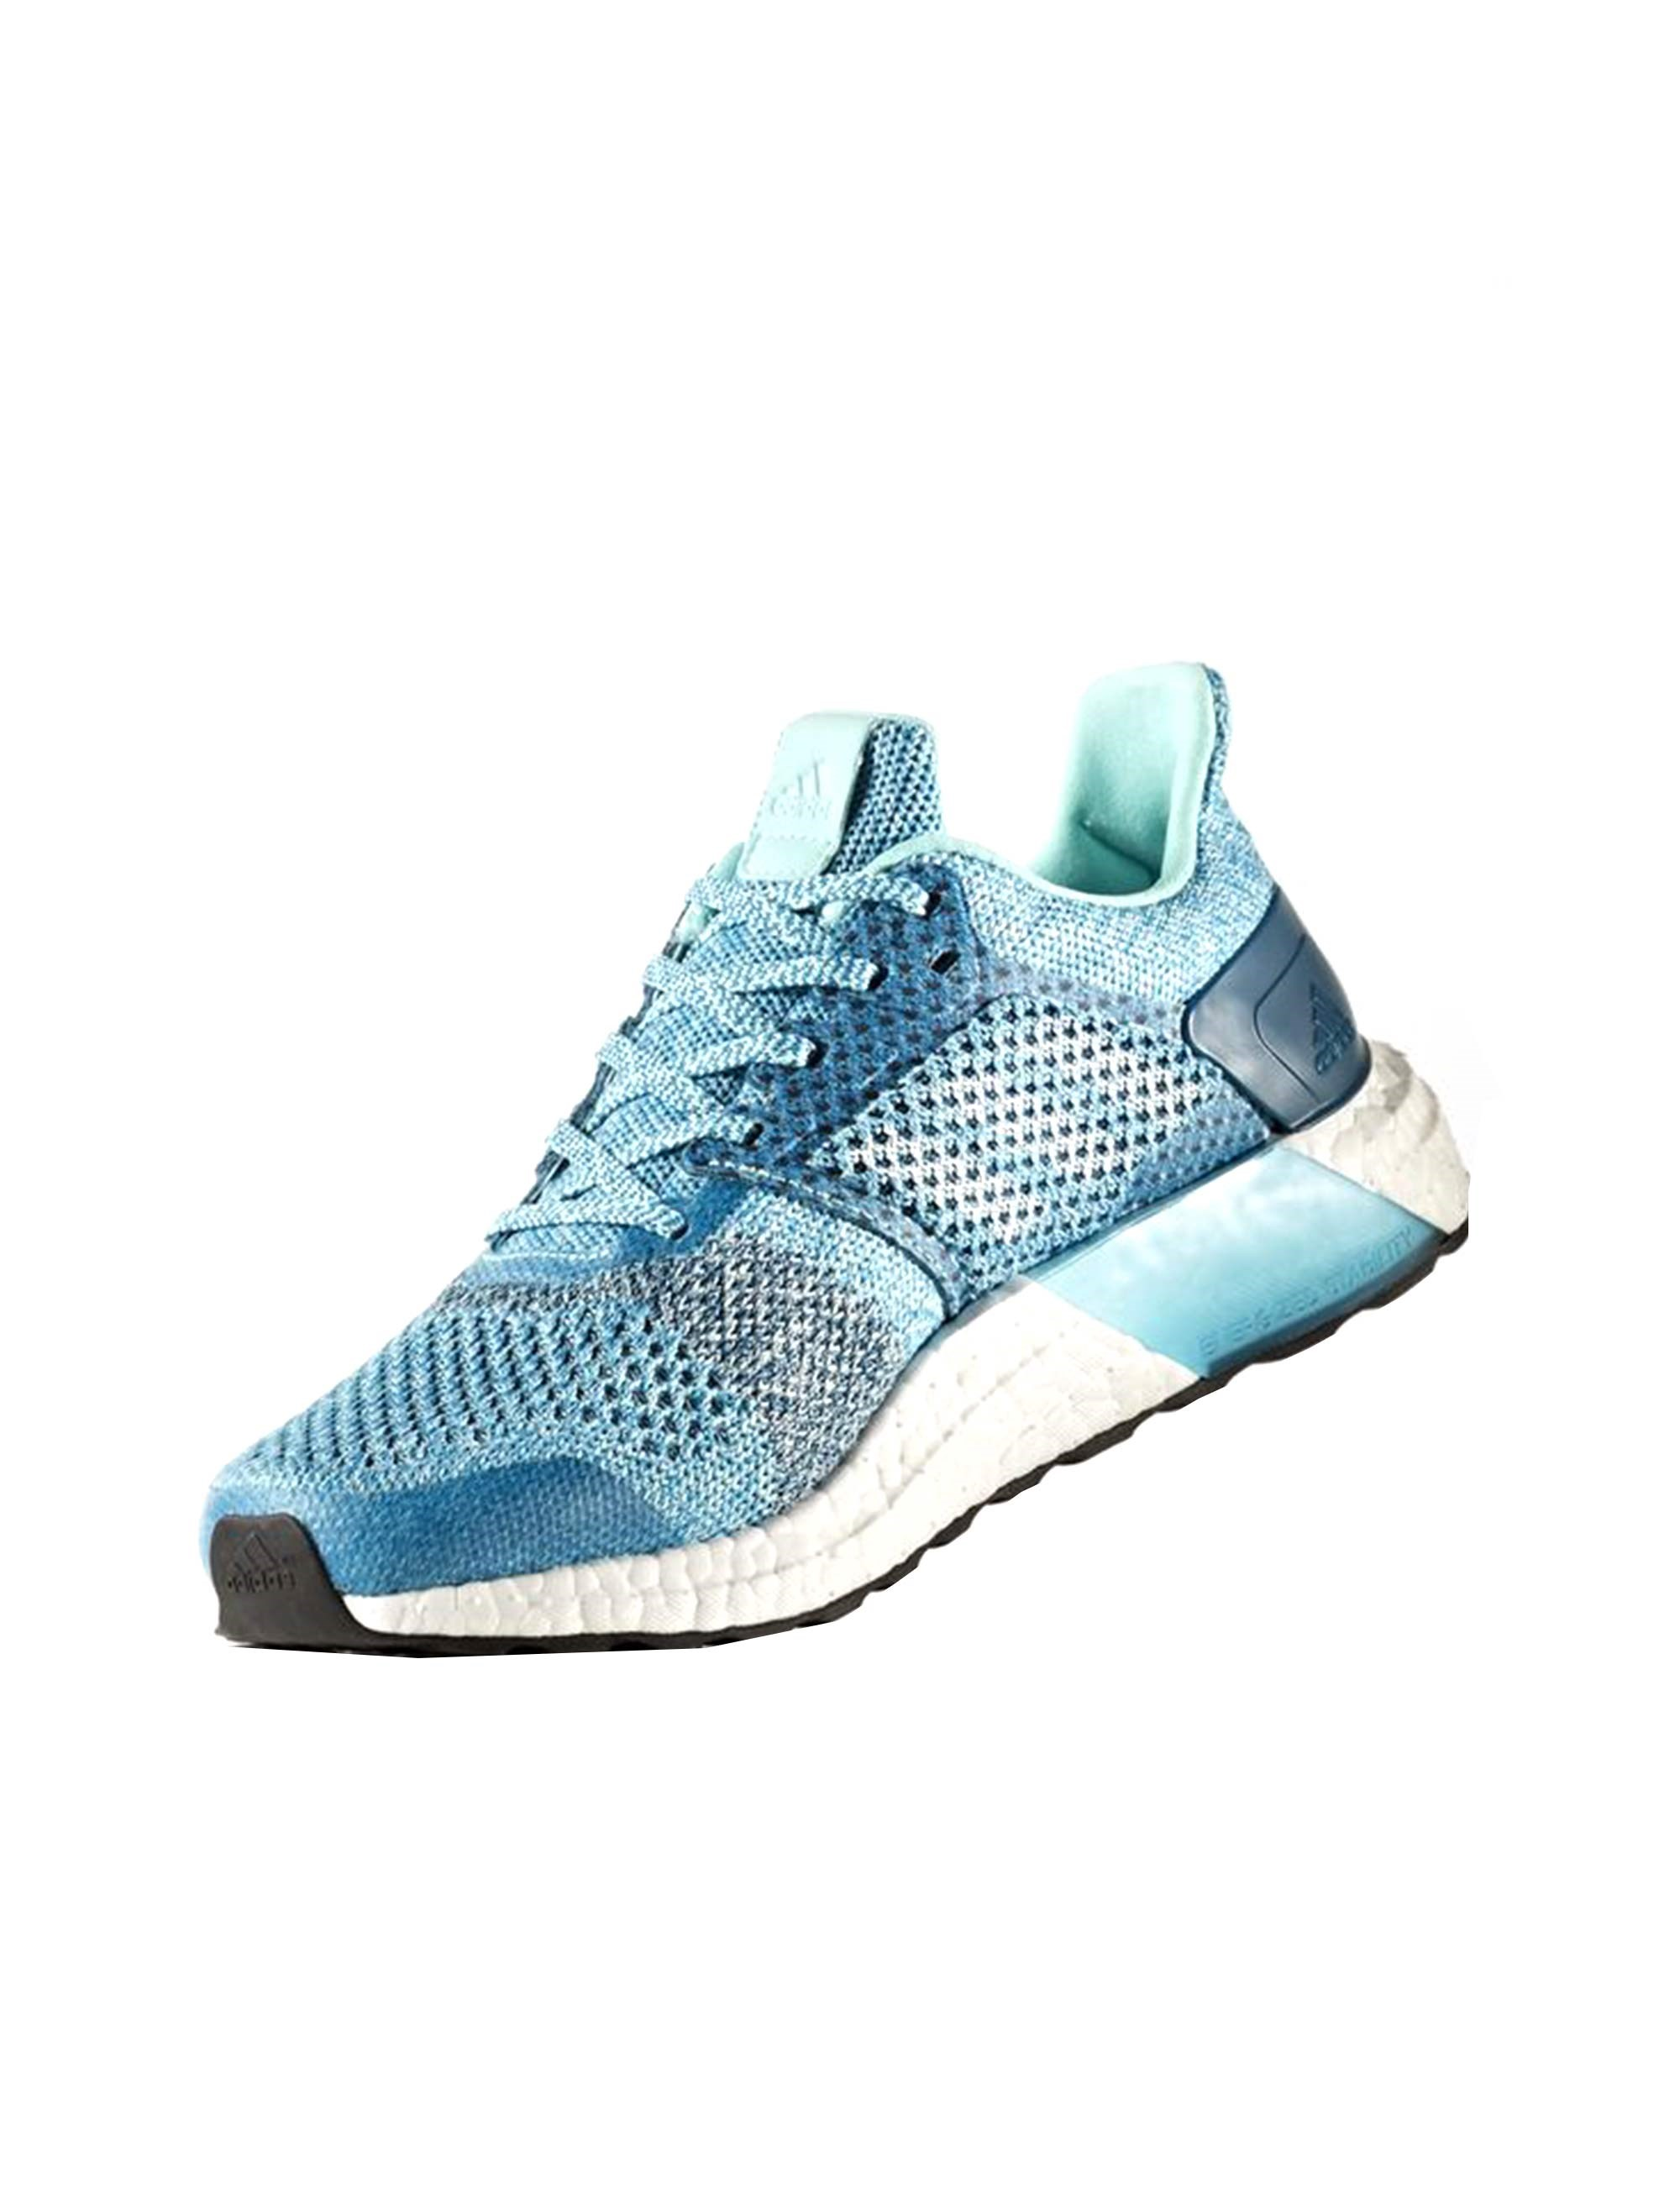 کفش مخصوص دویدن زنانه آدیداس مدل UltraBOOST ST